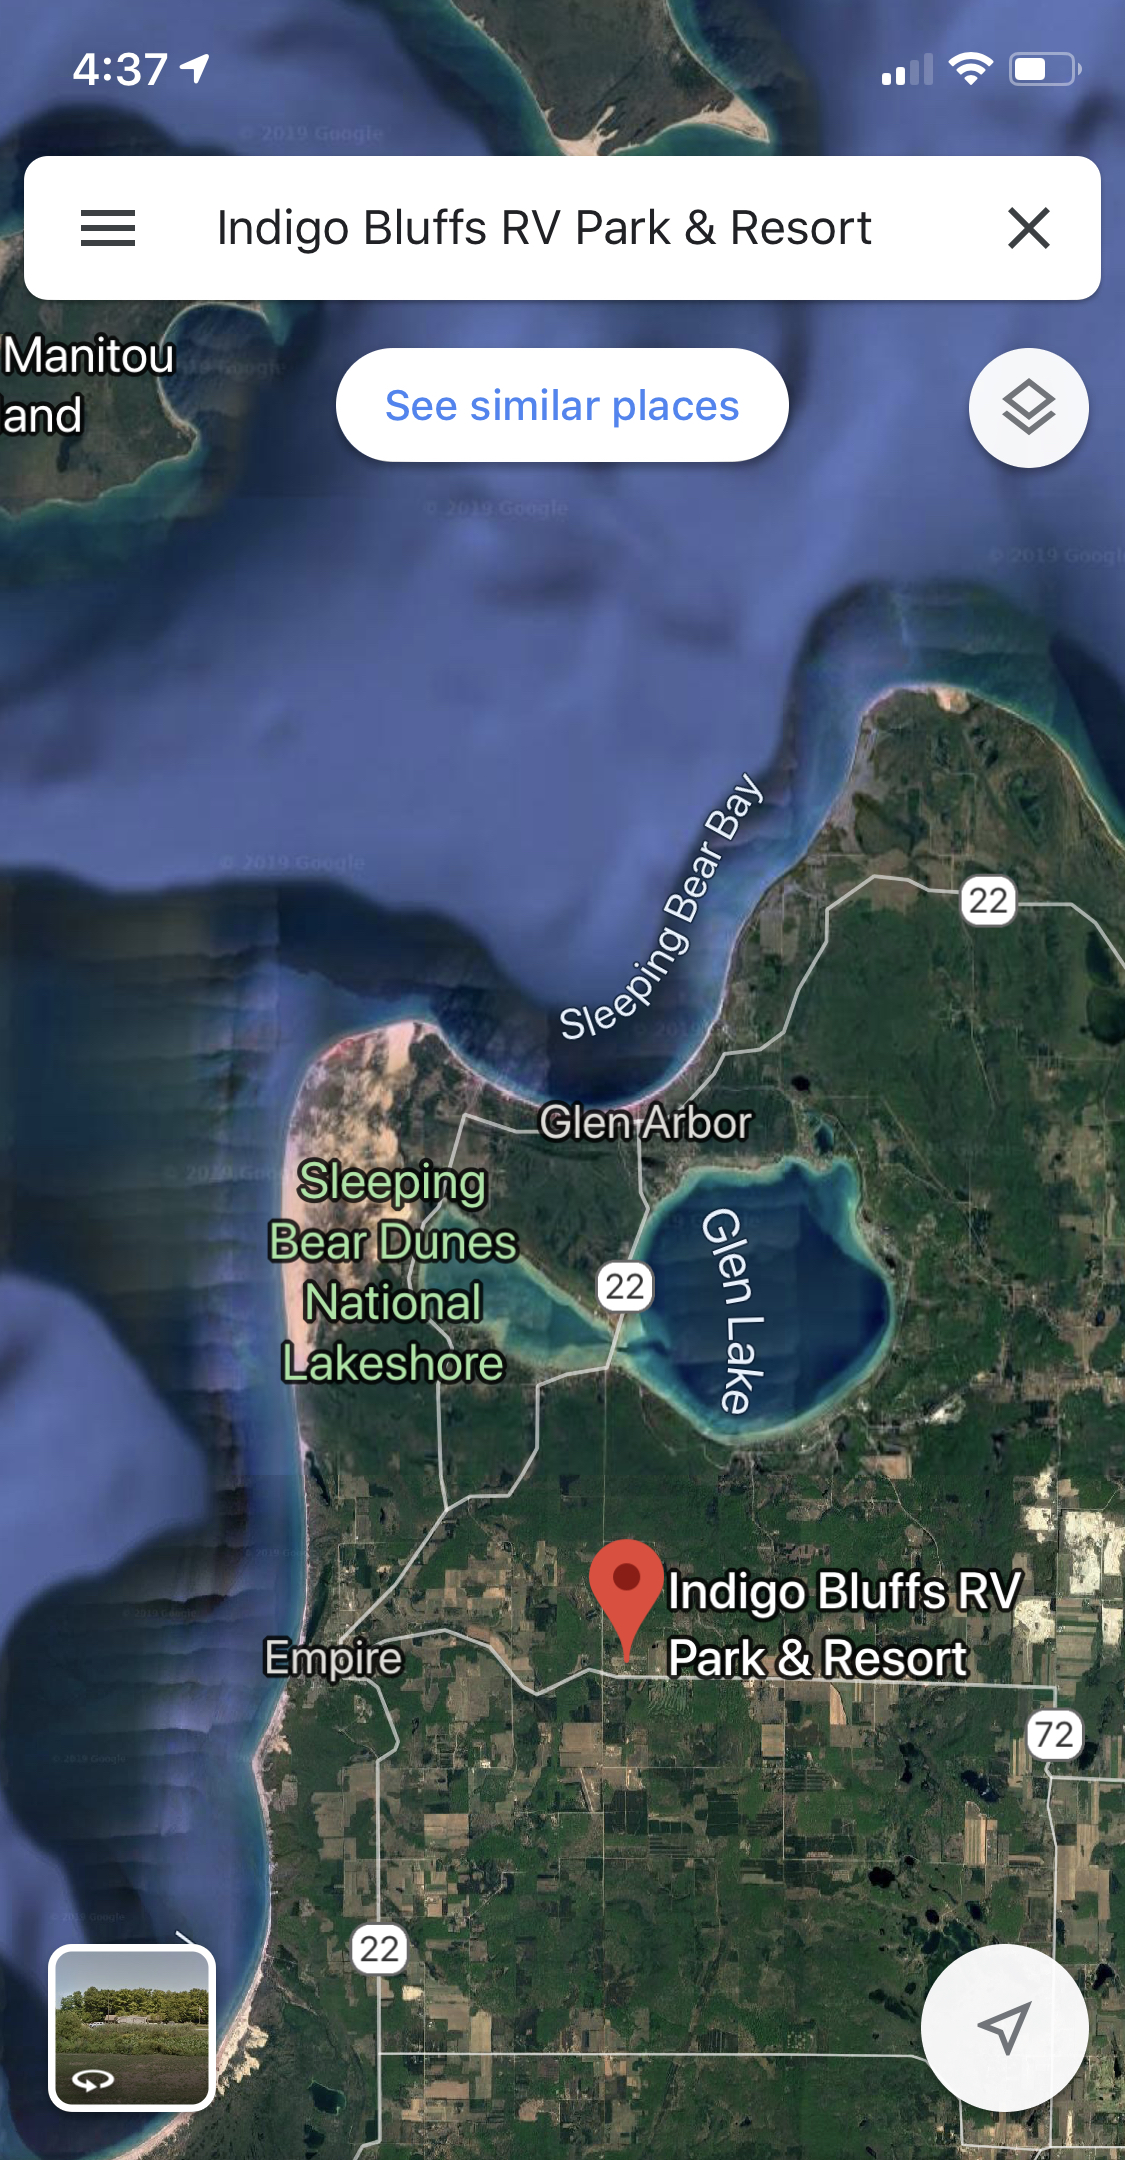 Surrounding area shown on Google Maps